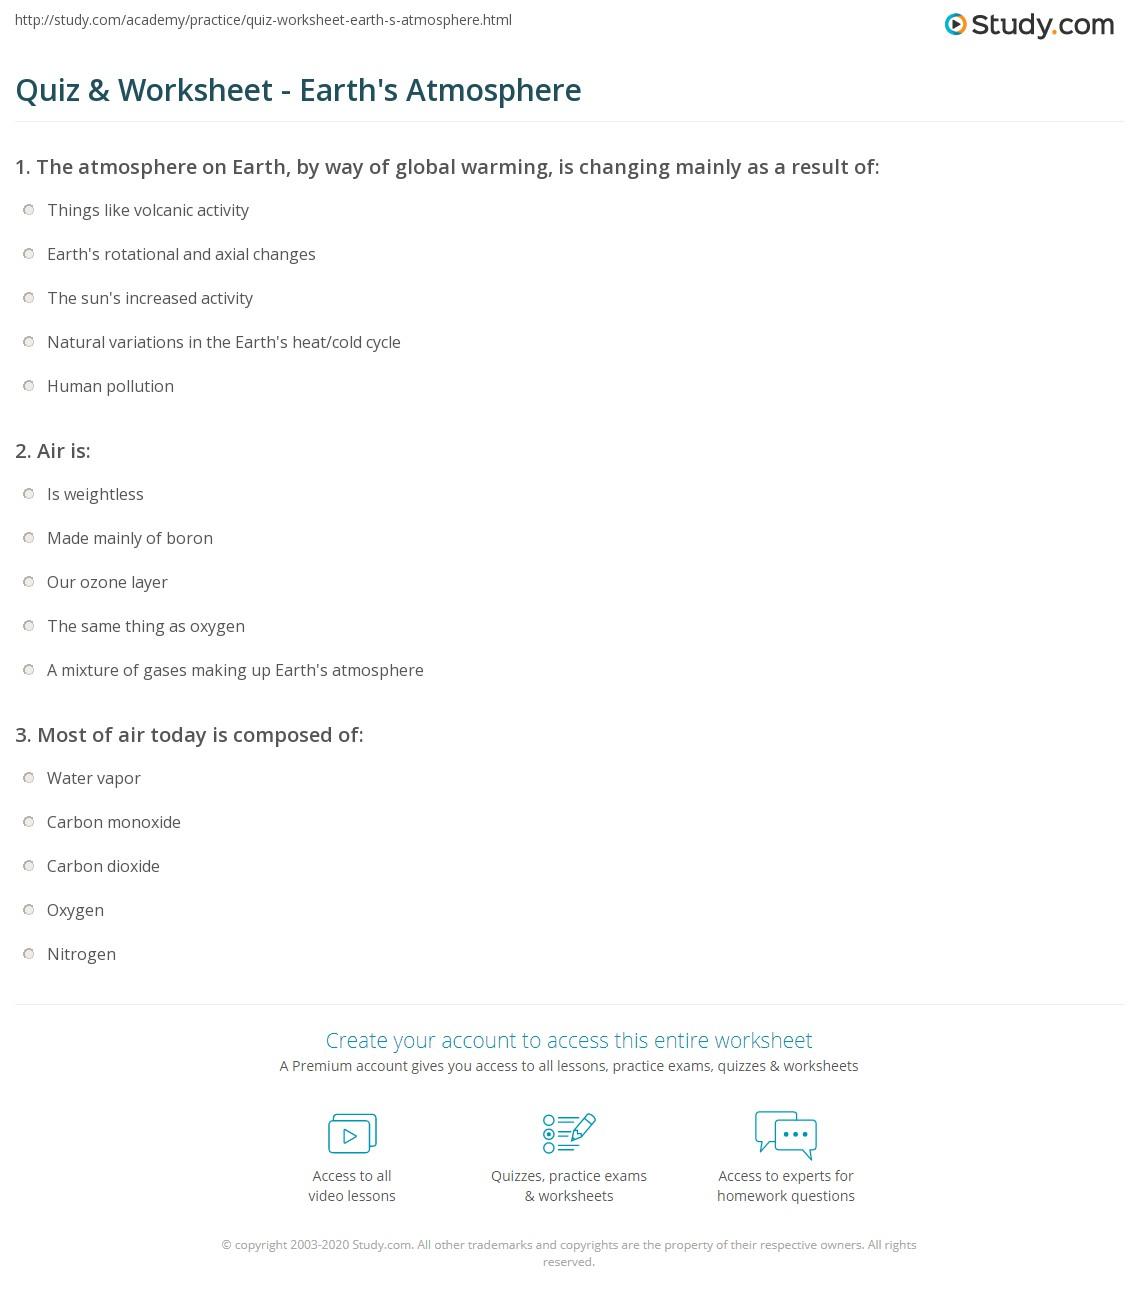 Quiz & Worksheet - Earth's Atmosphere | Study.com